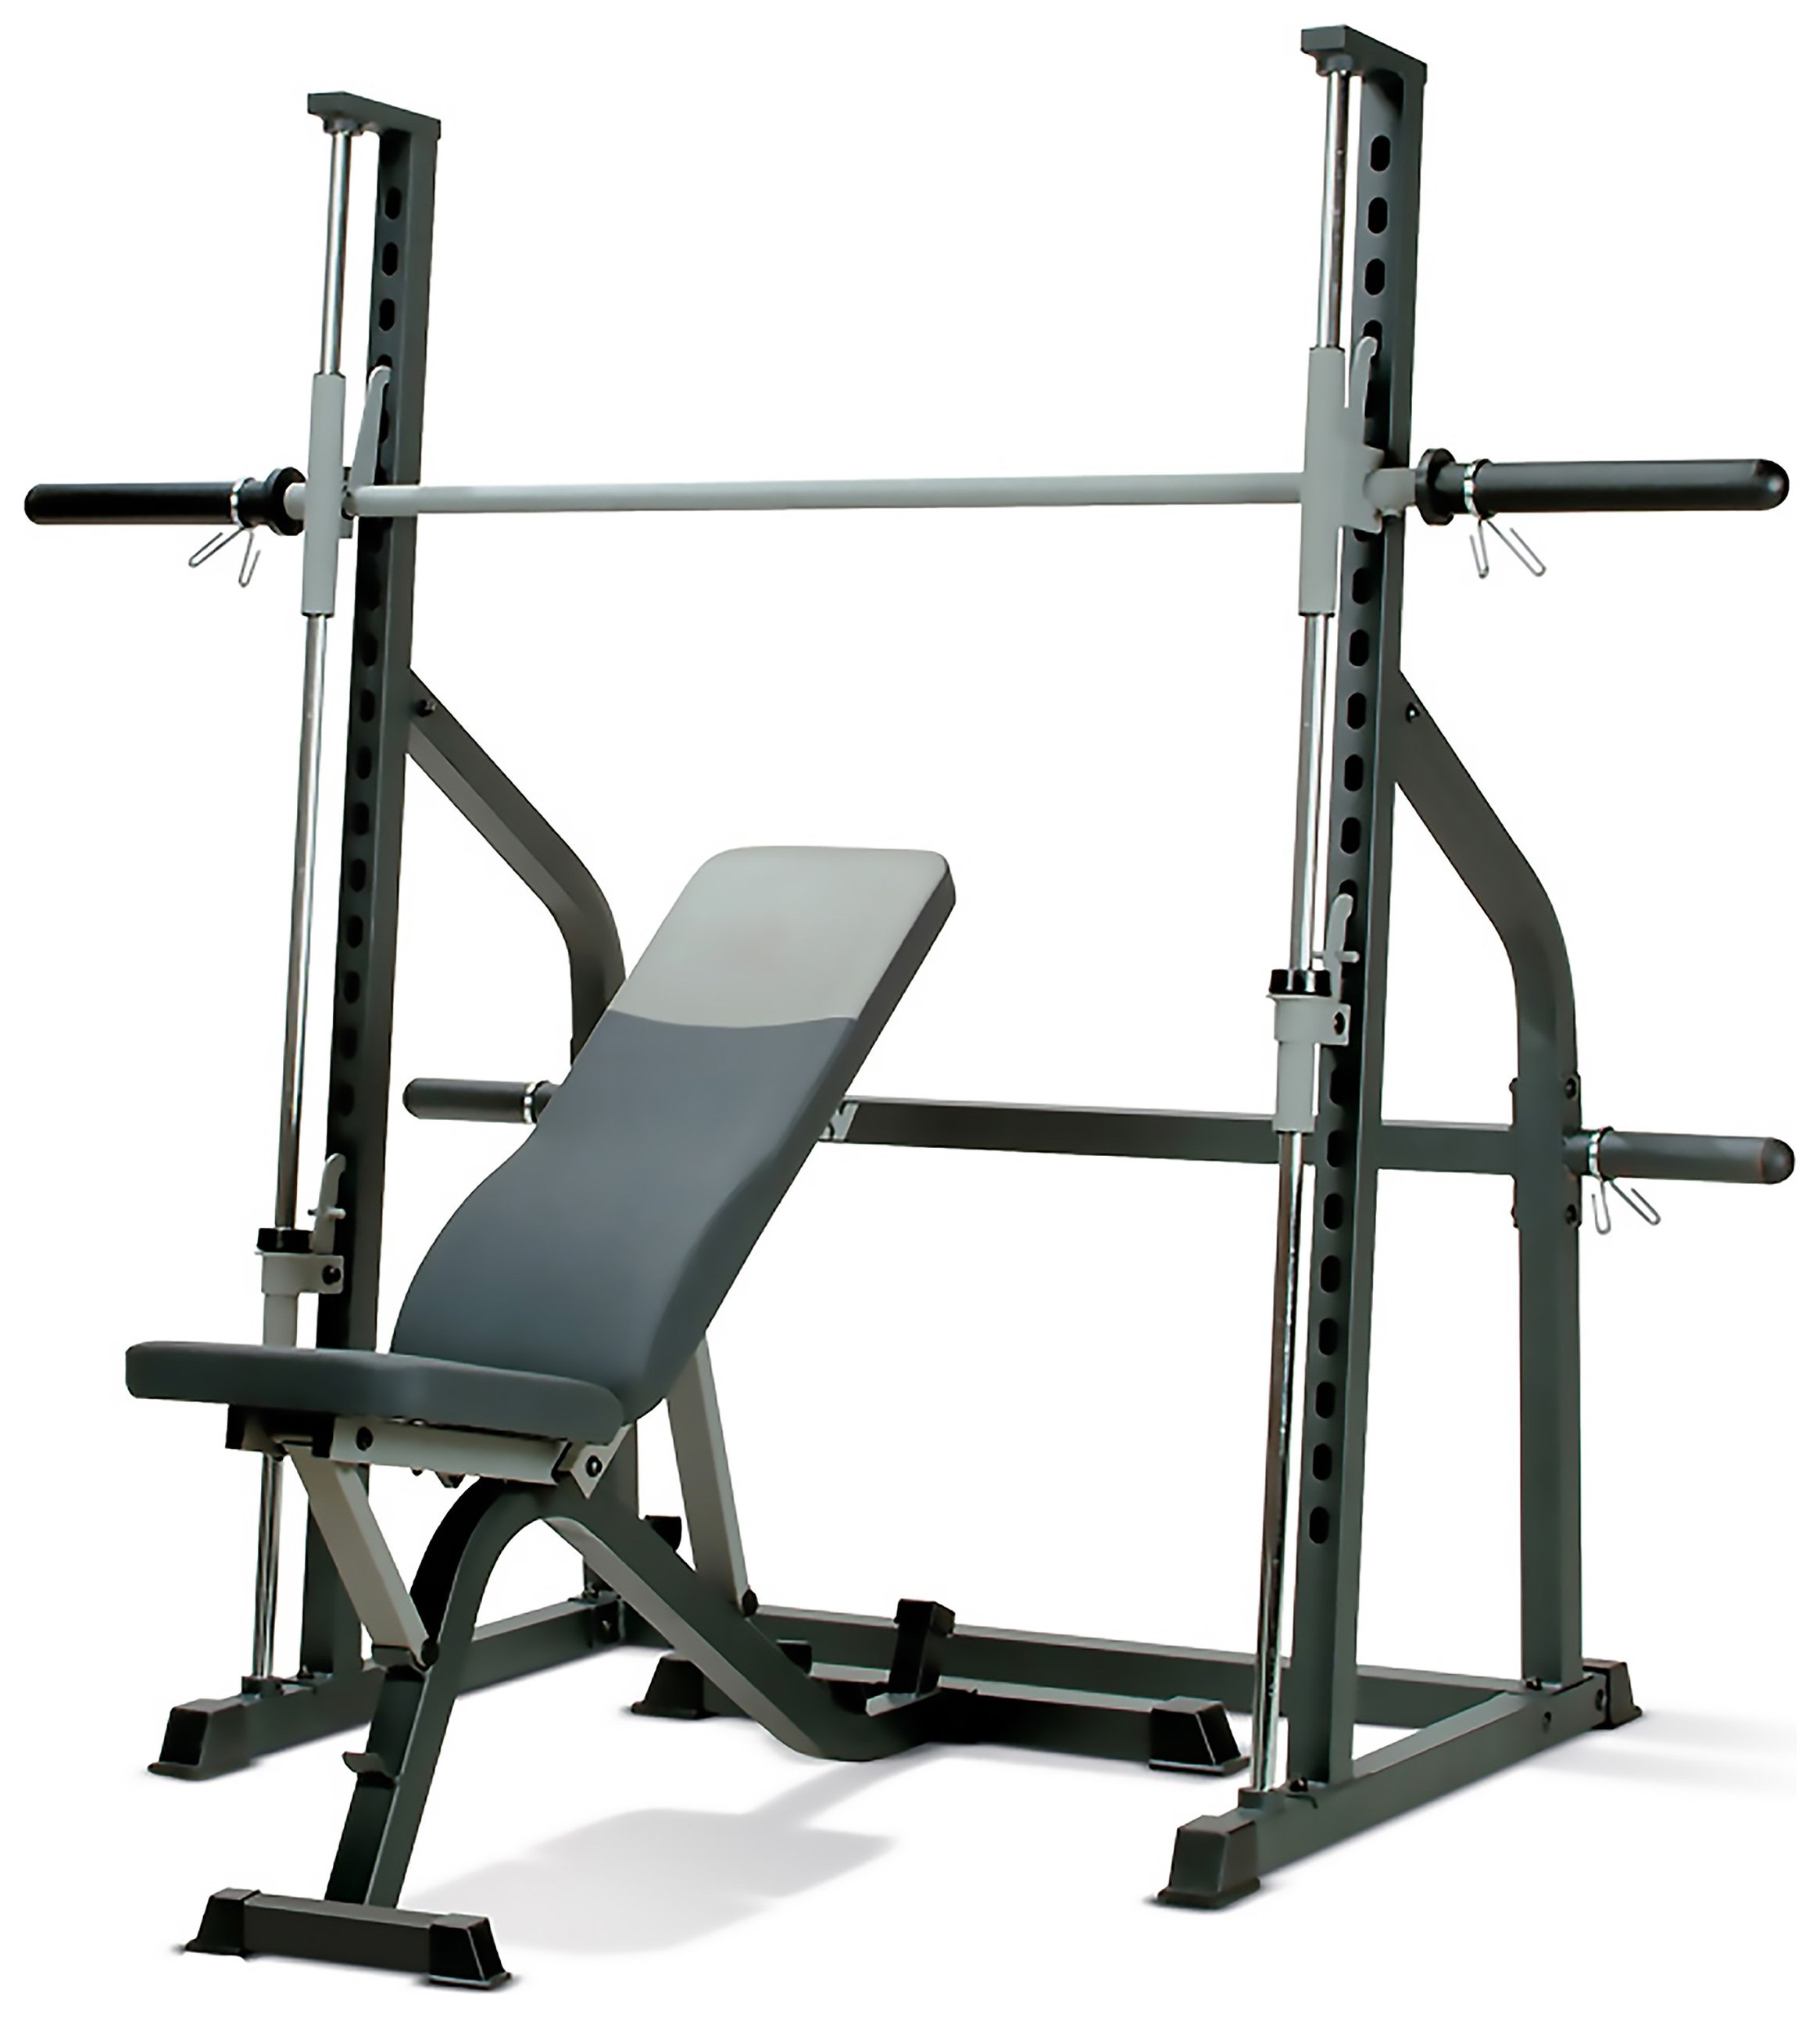 'Marcy Sm600 Smith Machine & Weight Bench.